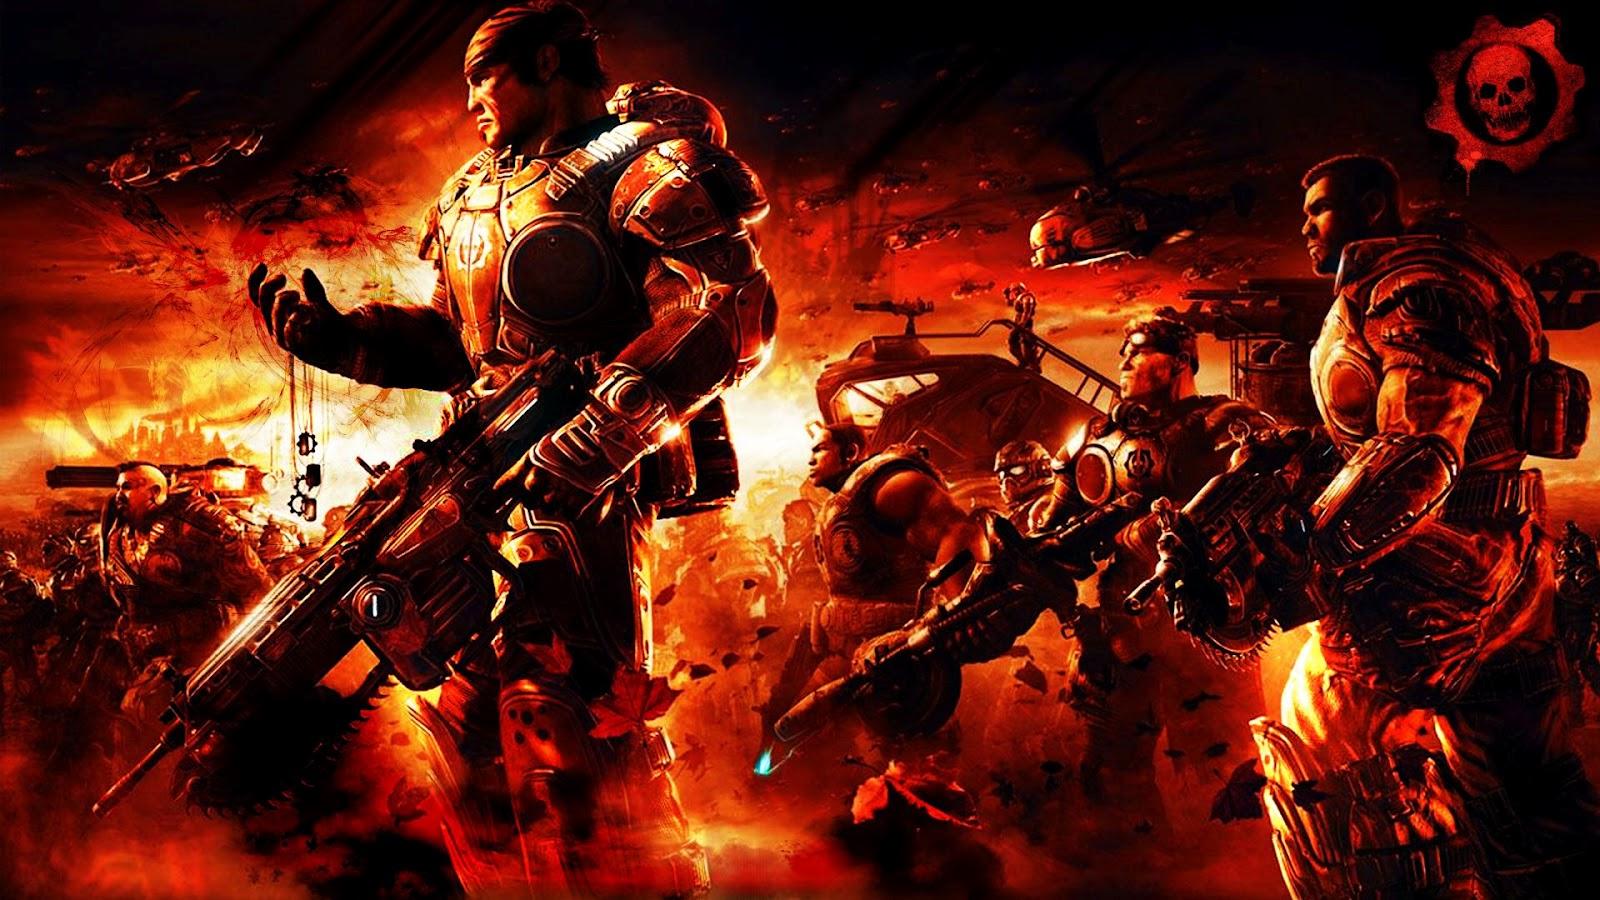 http://1.bp.blogspot.com/-w3ZCh5yJiC0/UBVs_6Z3XKI/AAAAAAAAFd0/oRQqa3NxN_8/s1600/Gears_Of_War_2.jpg